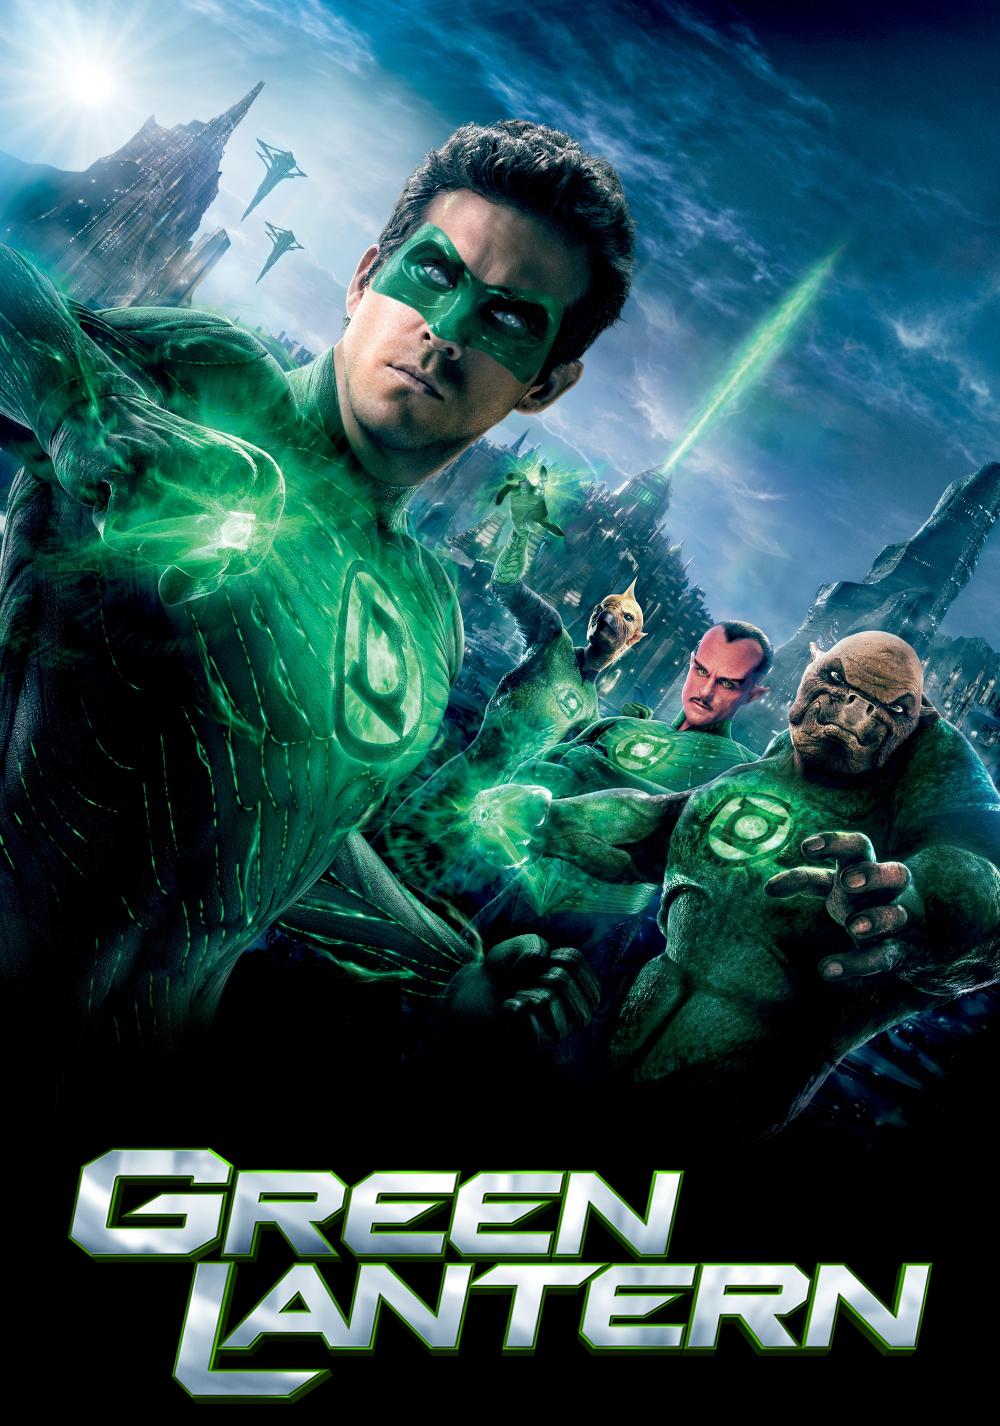 Green Lantern (Film) Besetzung